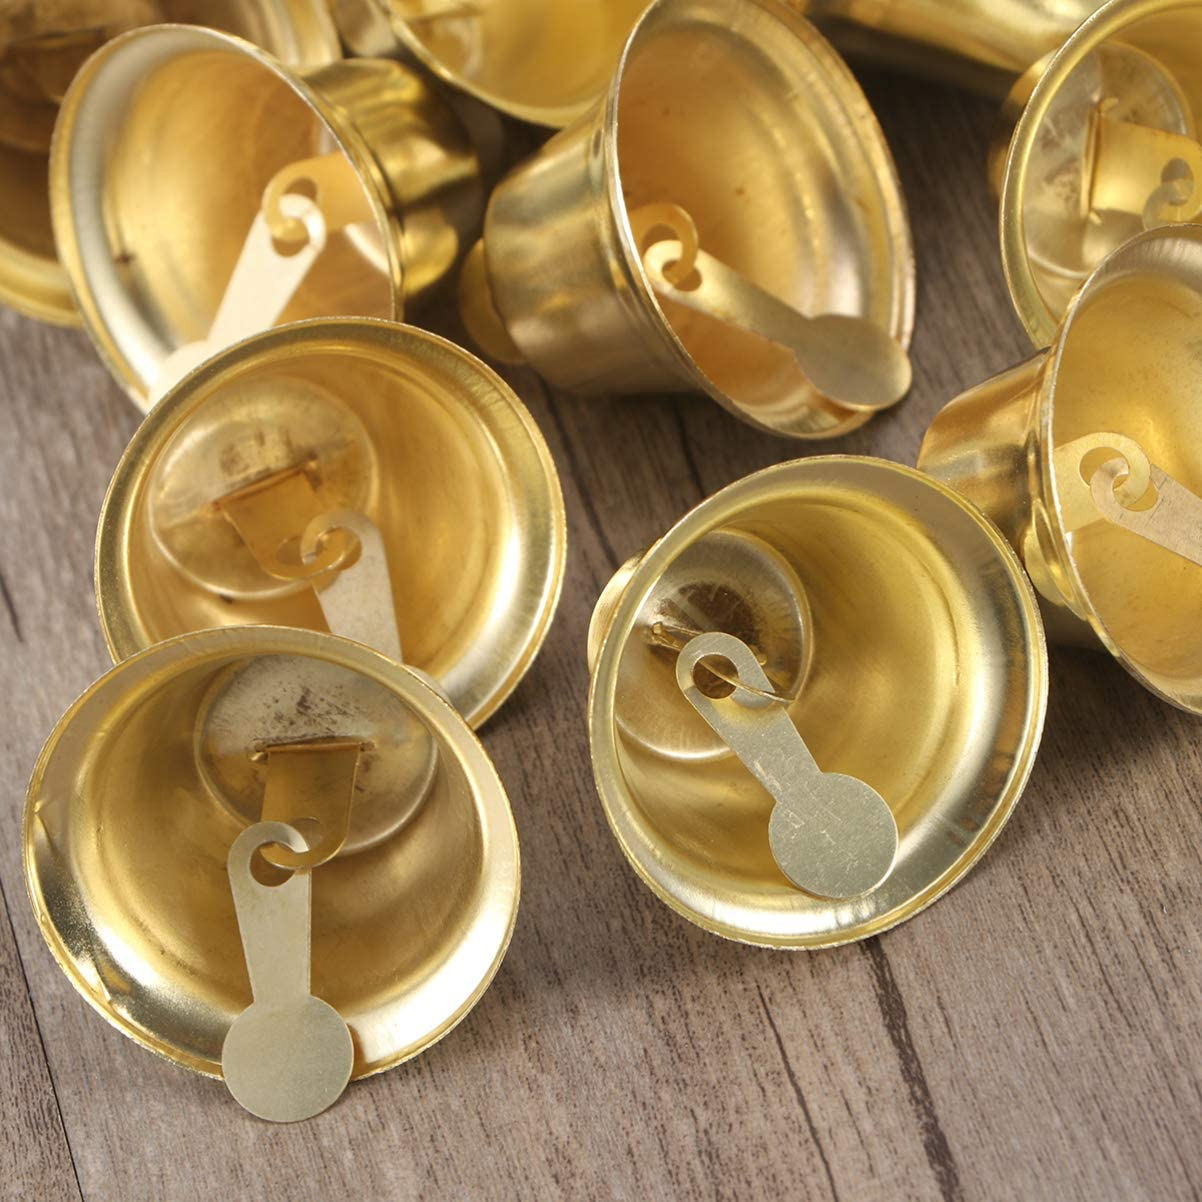 Amosfun 24 pieces craft bells jingle bells mini small bells golden wind chimes bells vintage iron bells Christmas DIY craft wind chimes